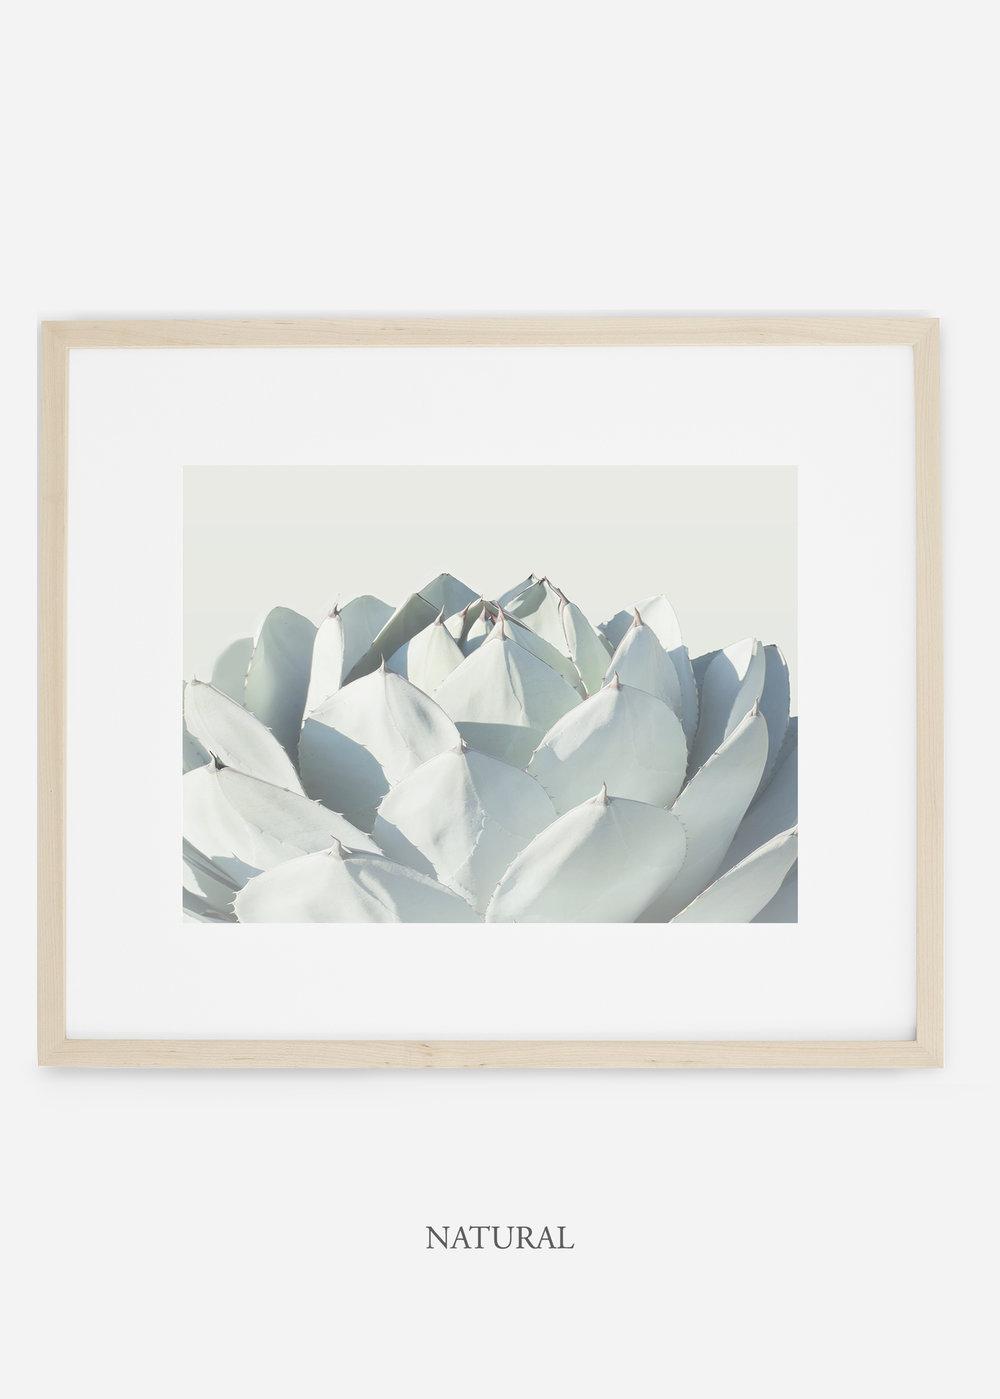 WilderCalifornia_naturalframe_Cactus_Art_Photography_interiordesign_white_bohemian_neutral_photography_photo.jpg